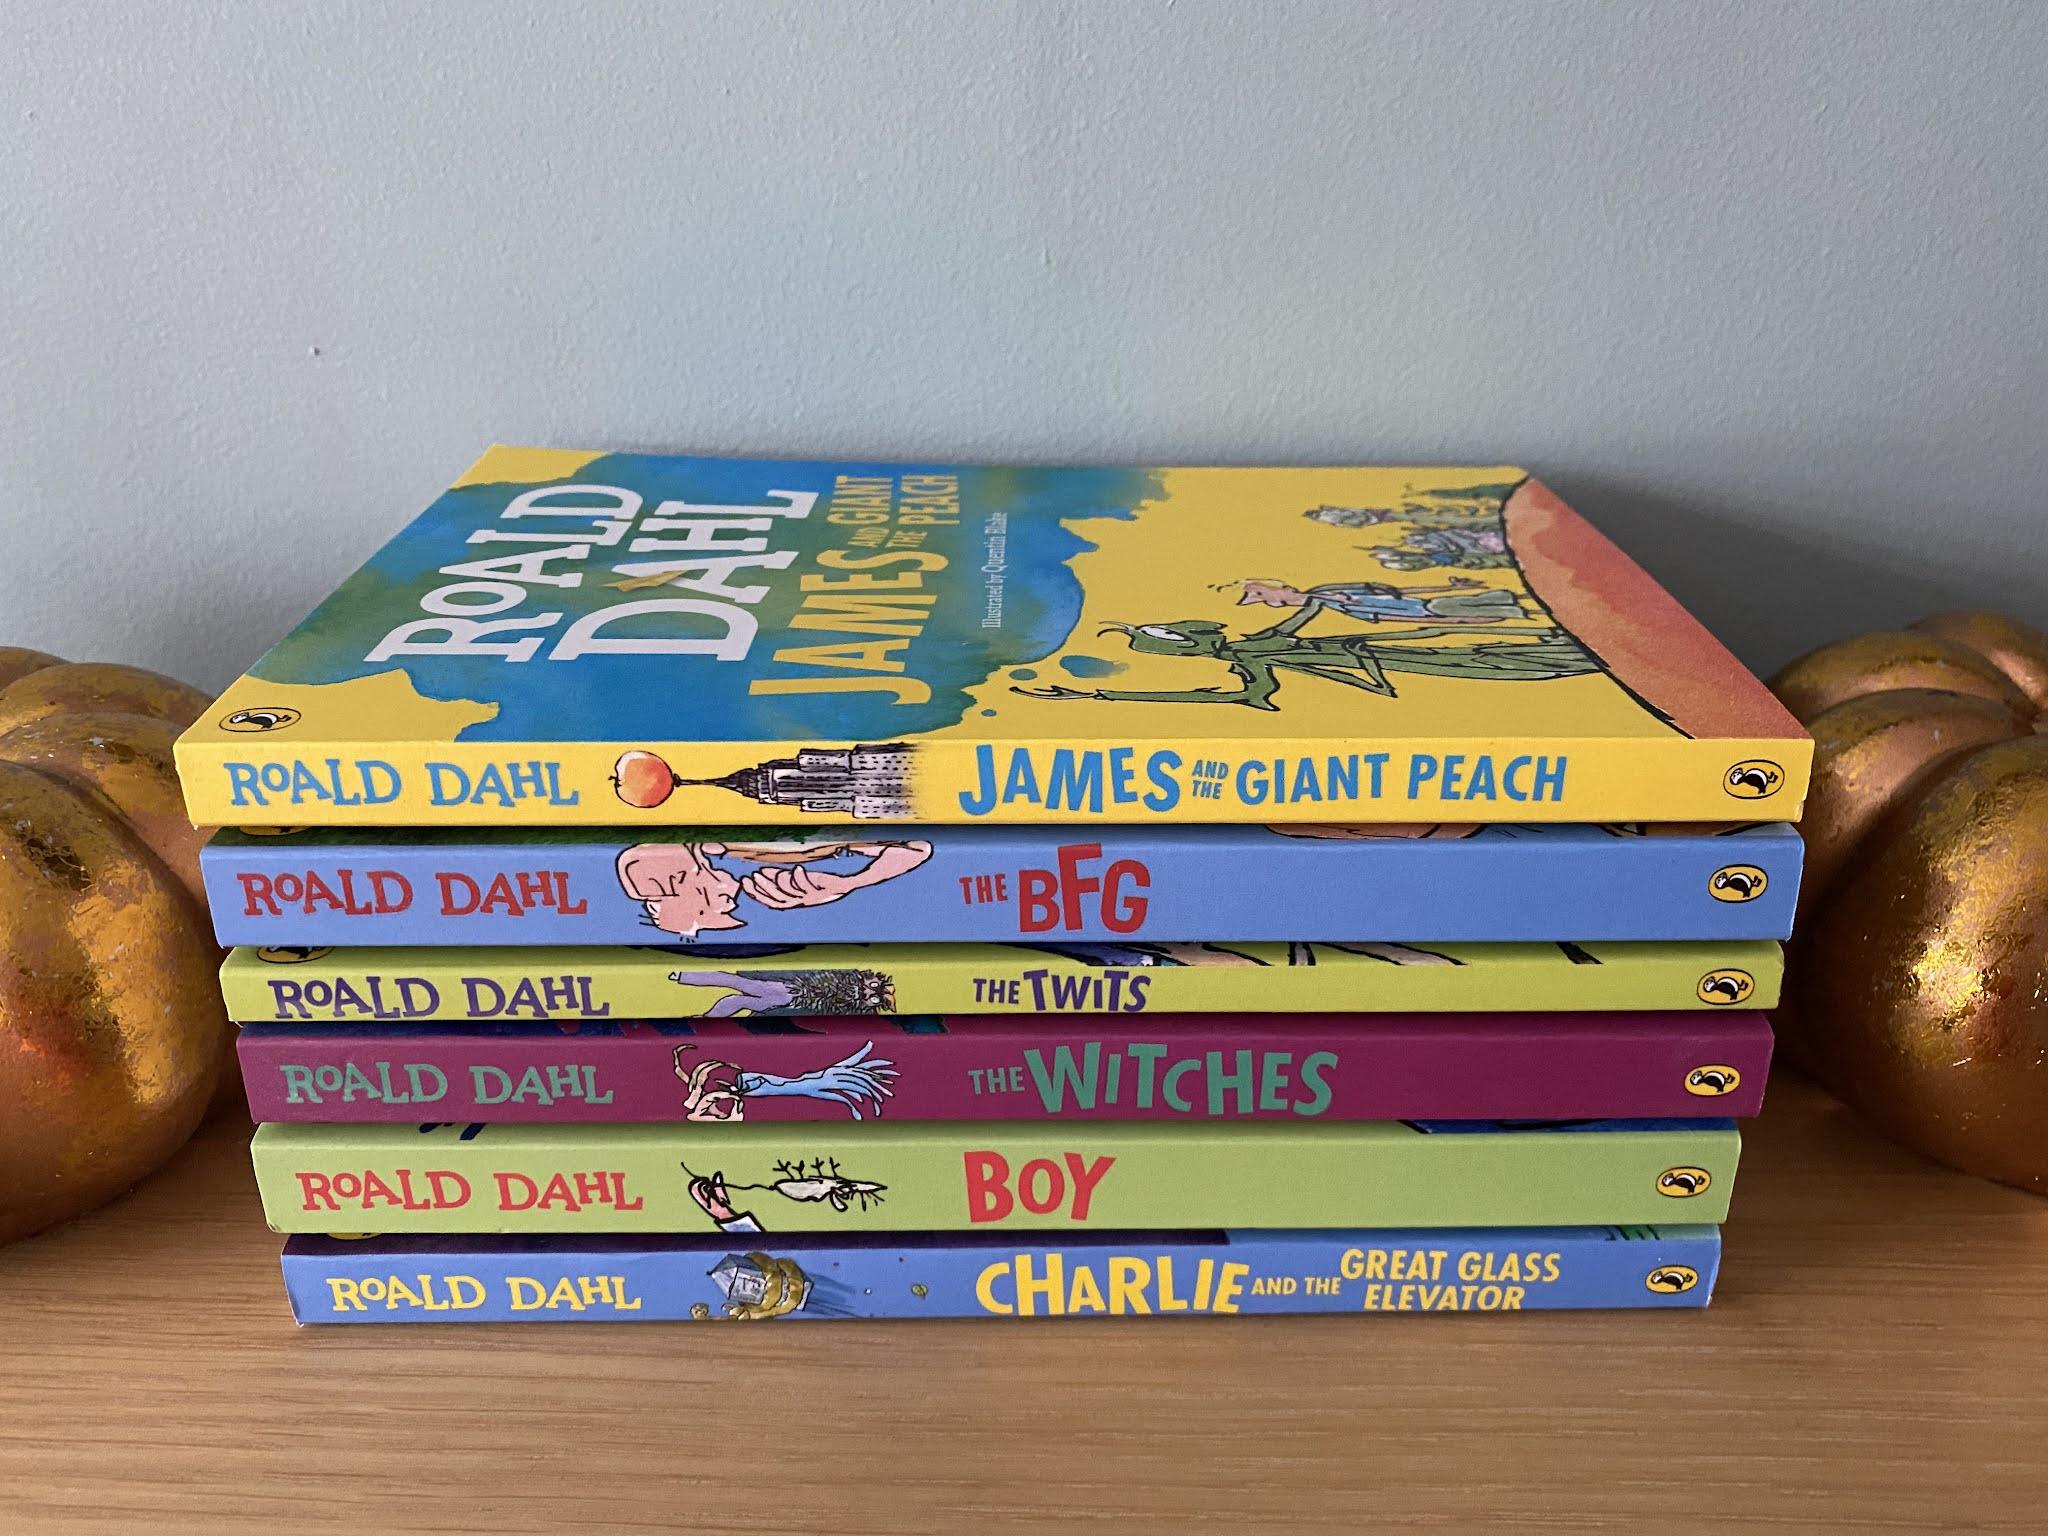 a selection of Roald Dahl books